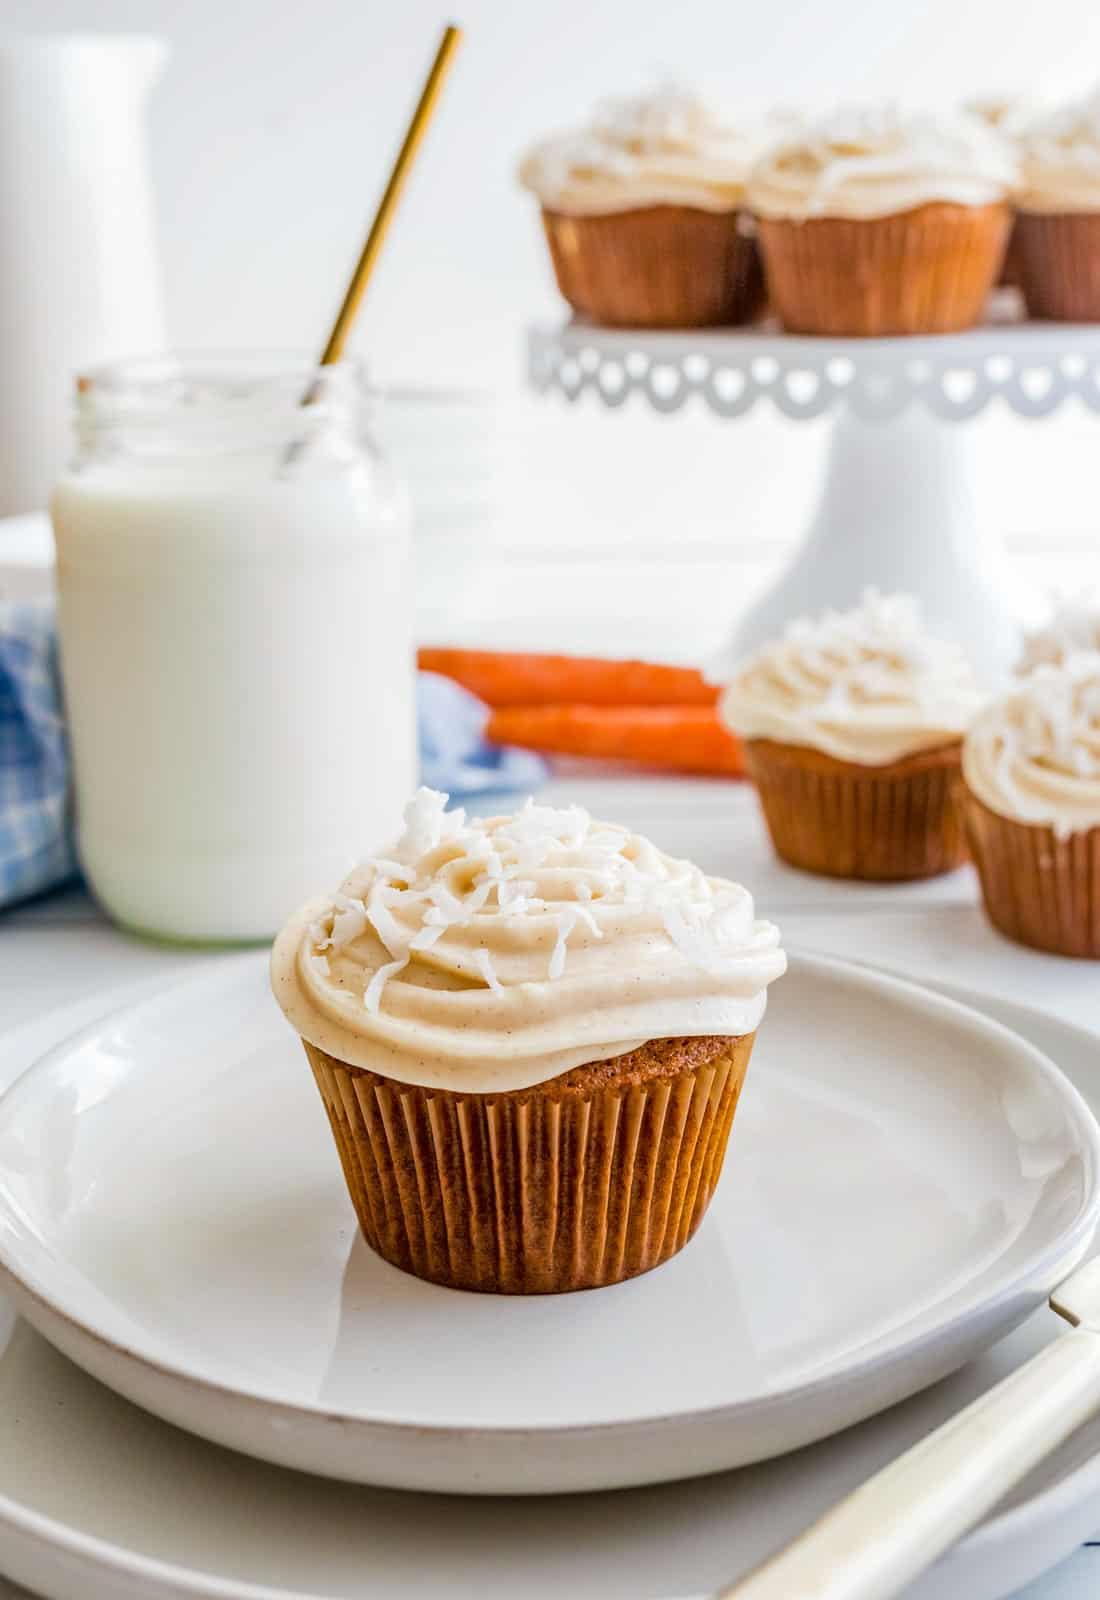 Single cupcake on white plate